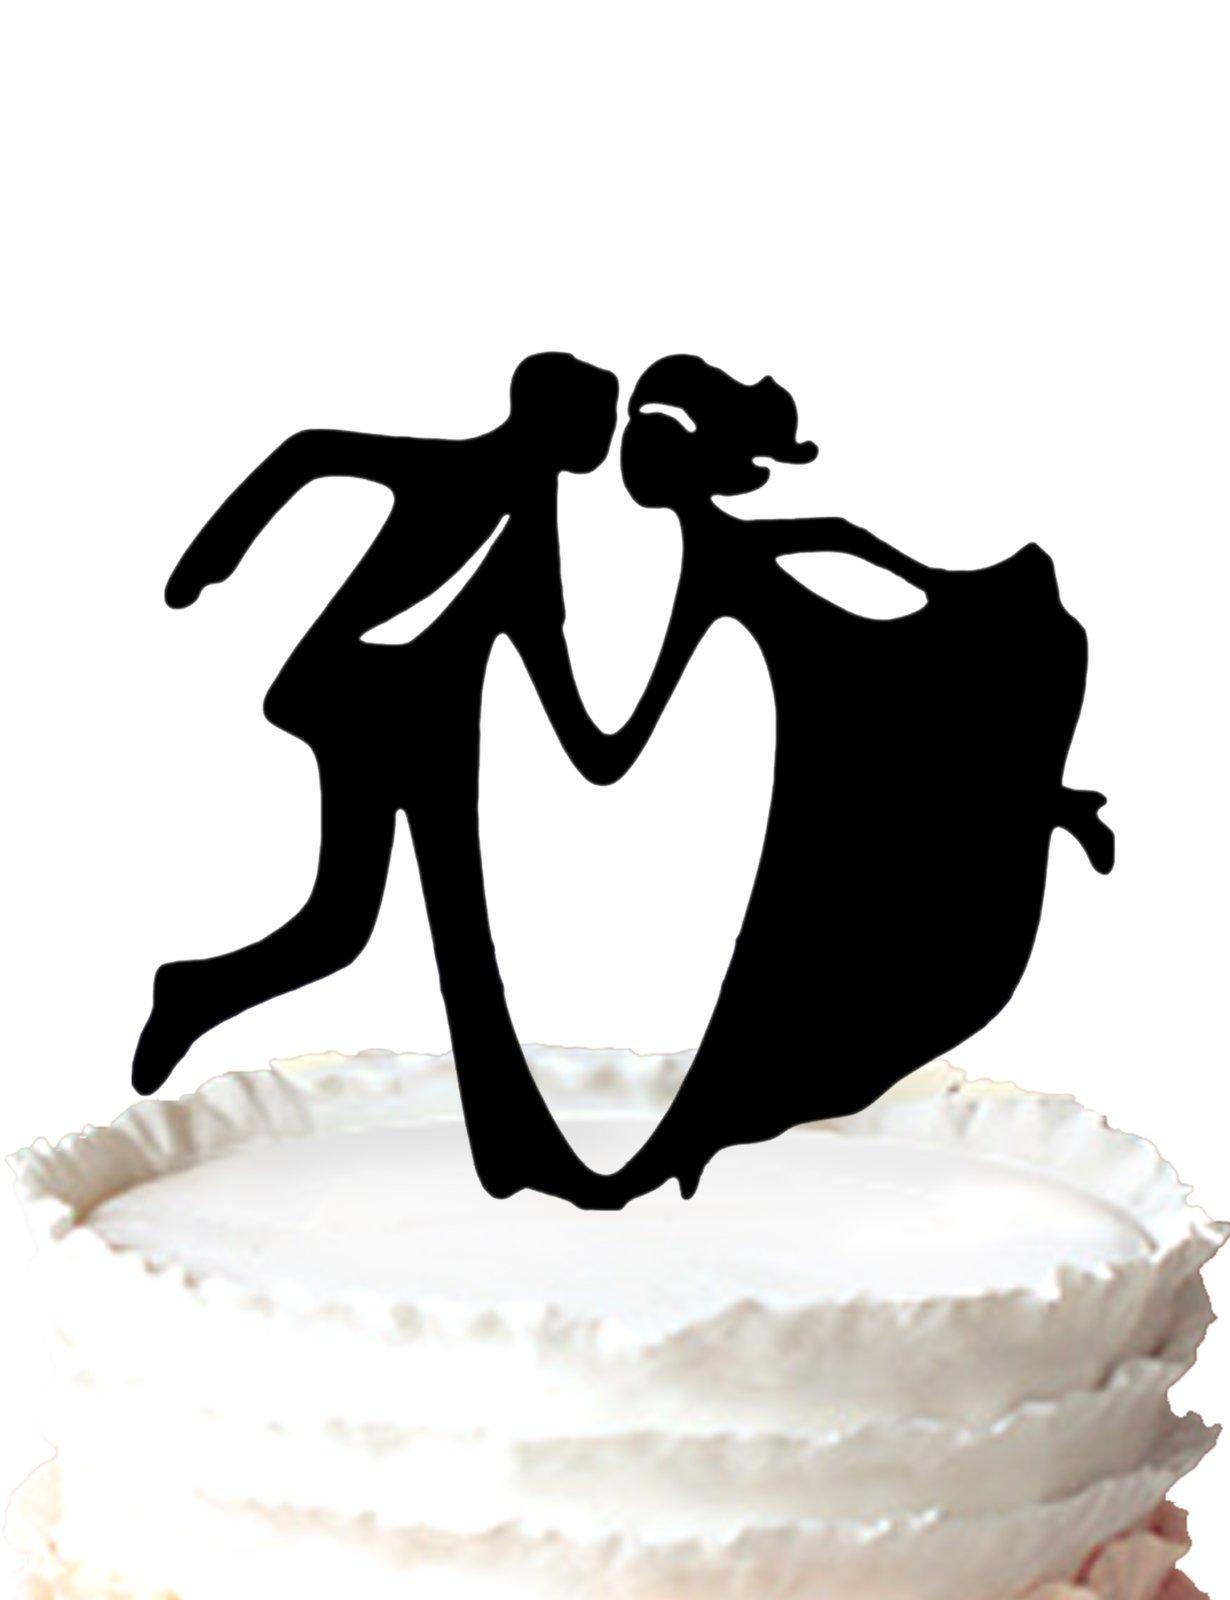 Kaishihui Bride and Groom dacing wedding Cake Topper